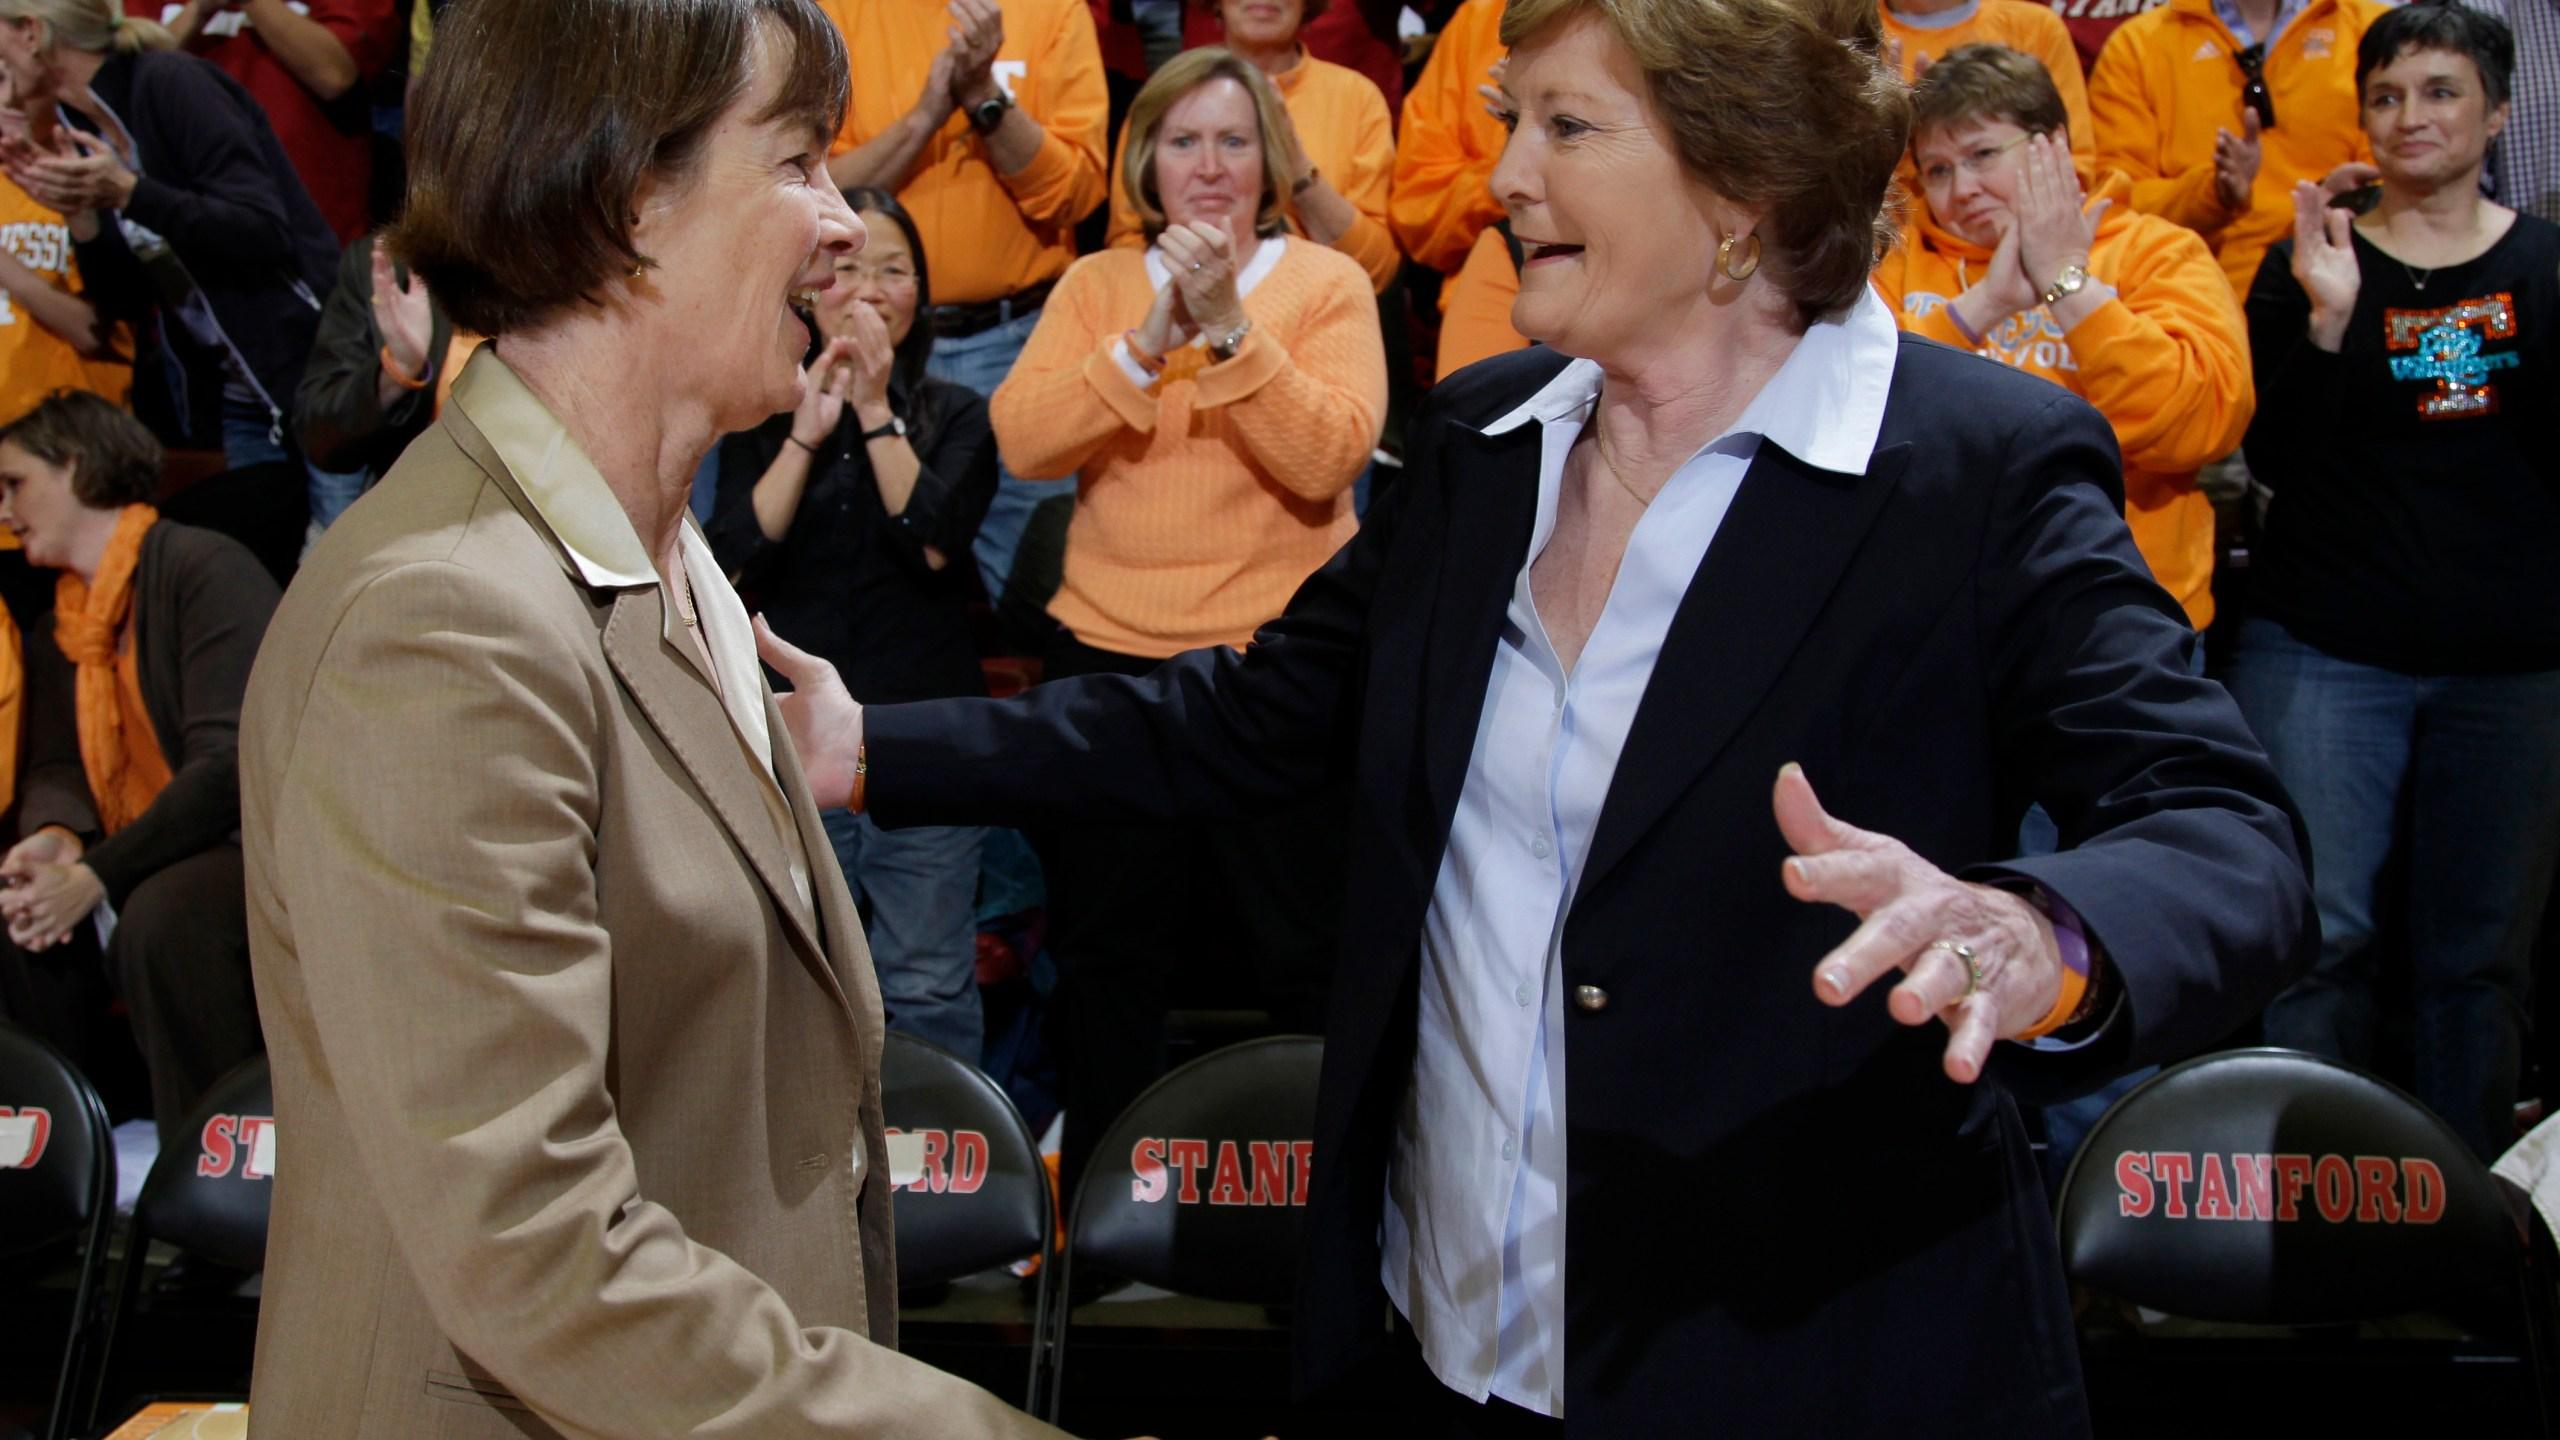 Stanford head coach Tara VanDerveer, Tennessee head coach Pat Summitt